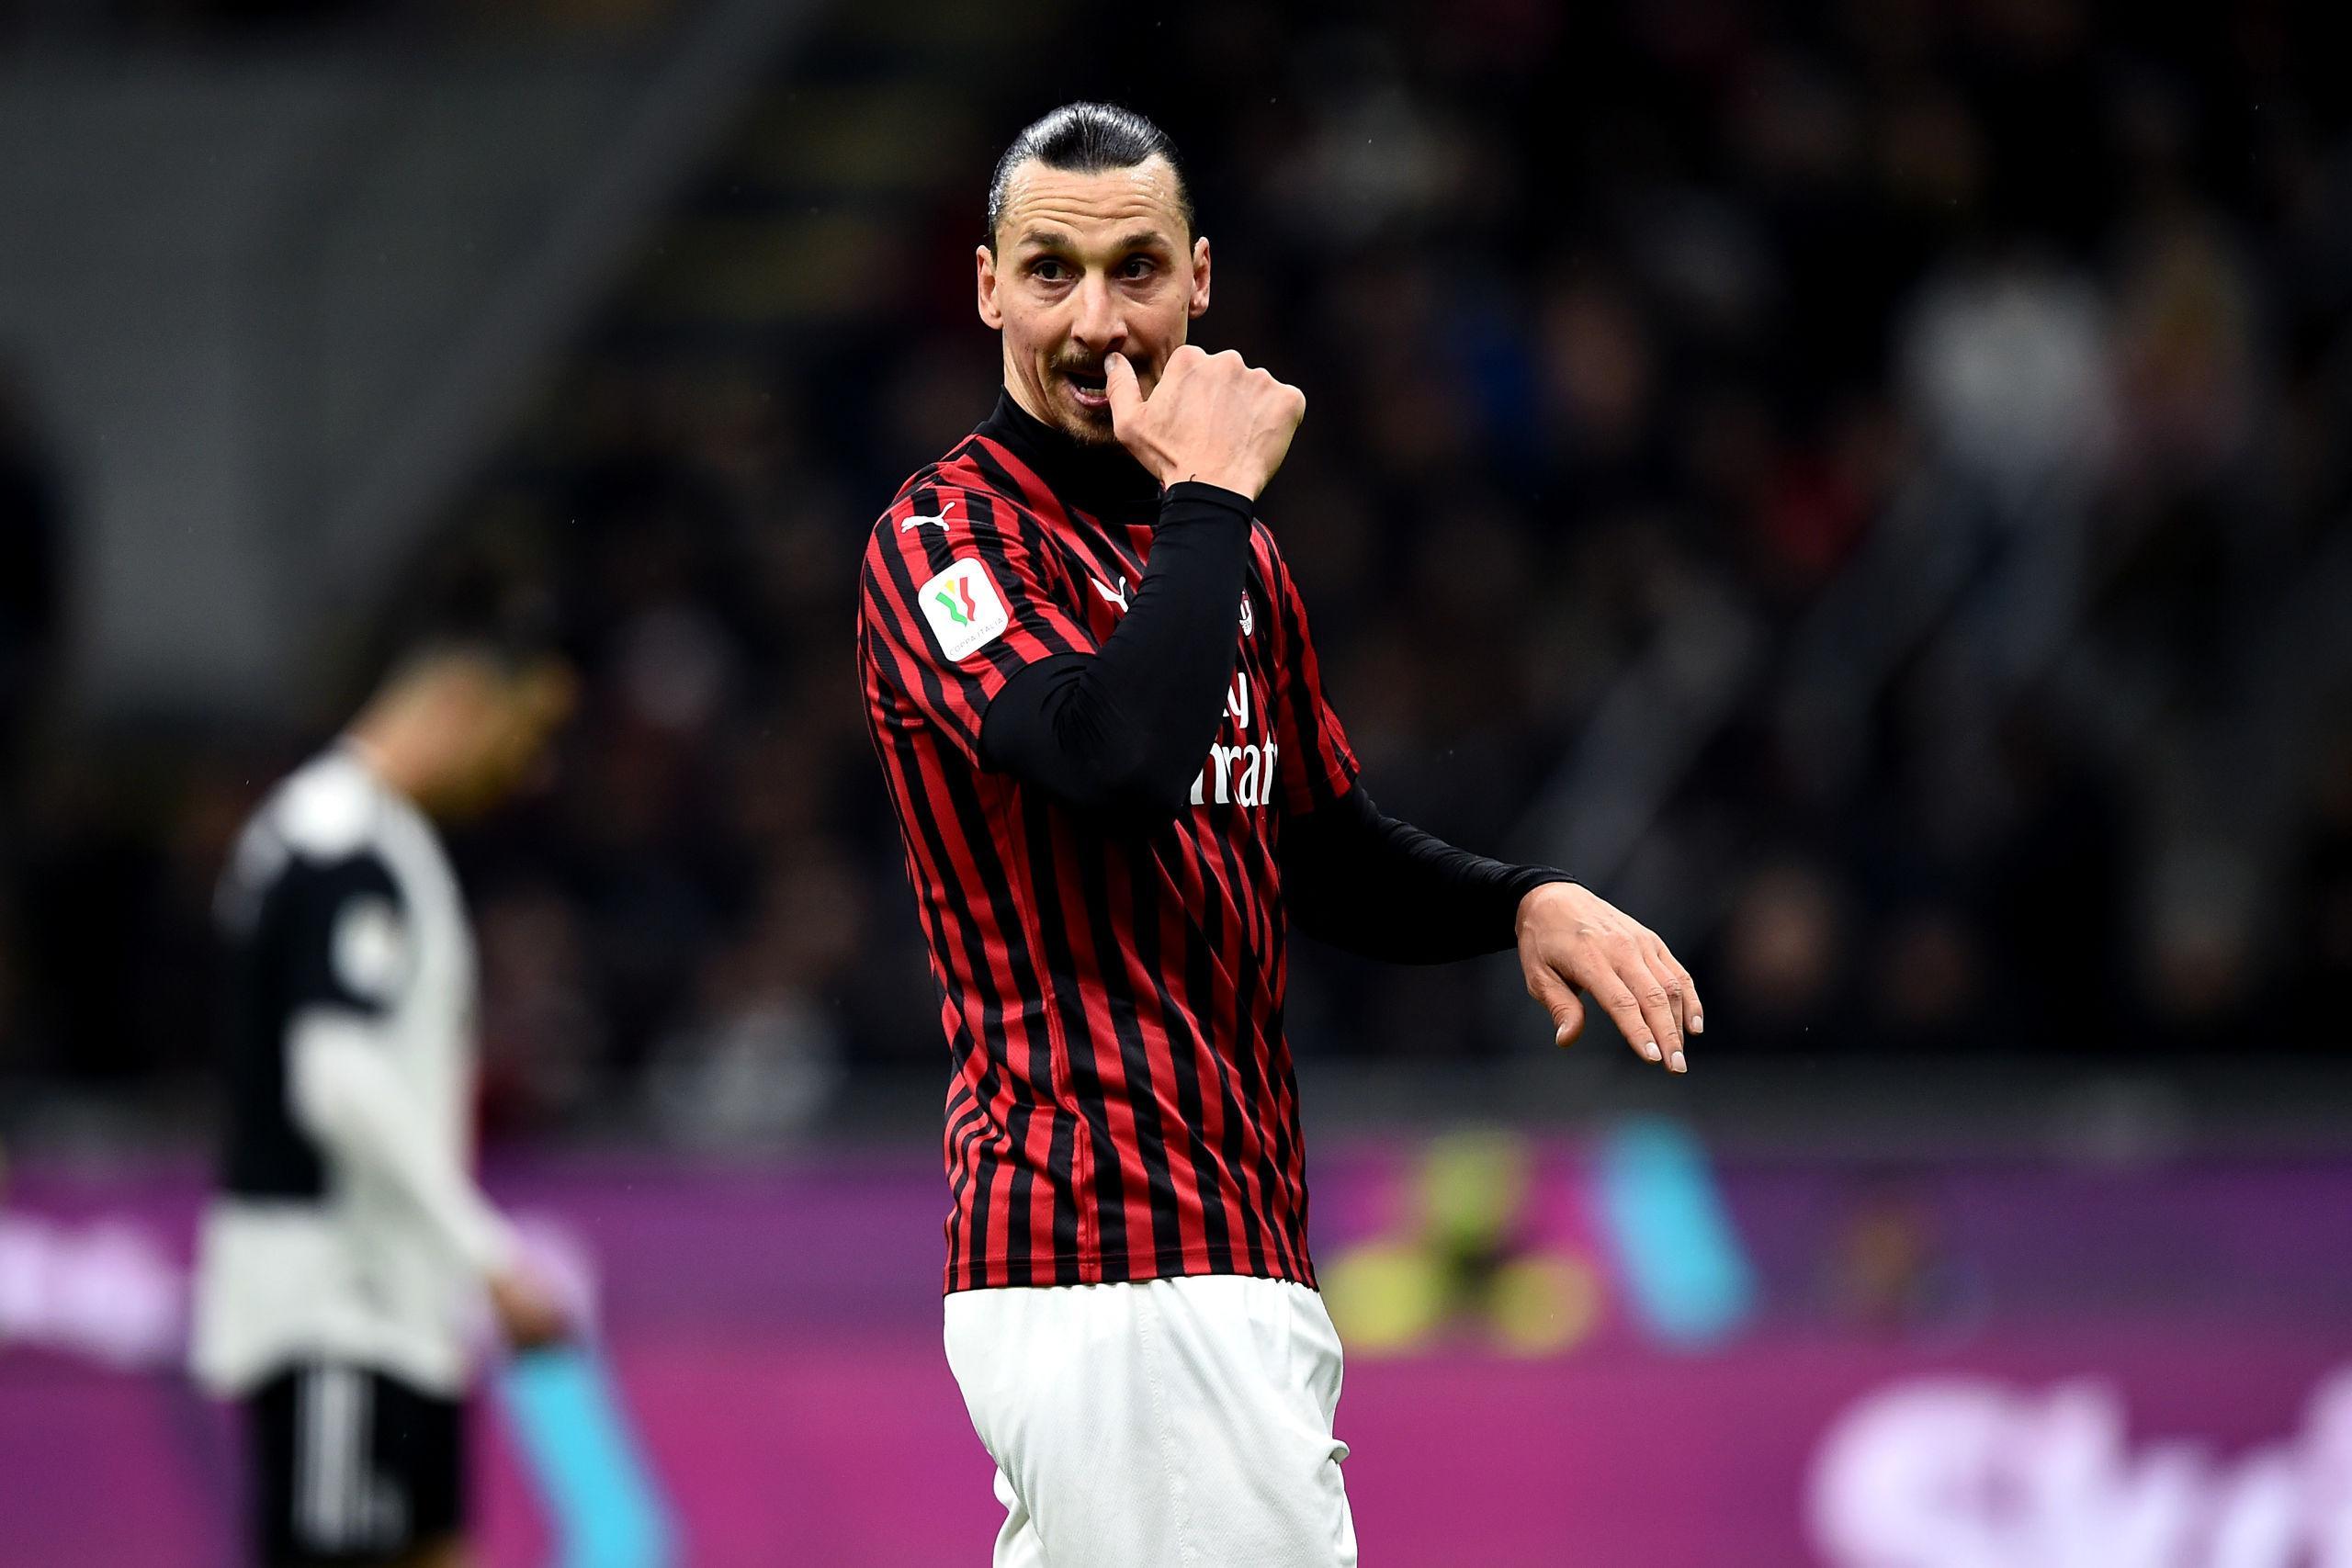 Milan: Zlatan stannar i klubben